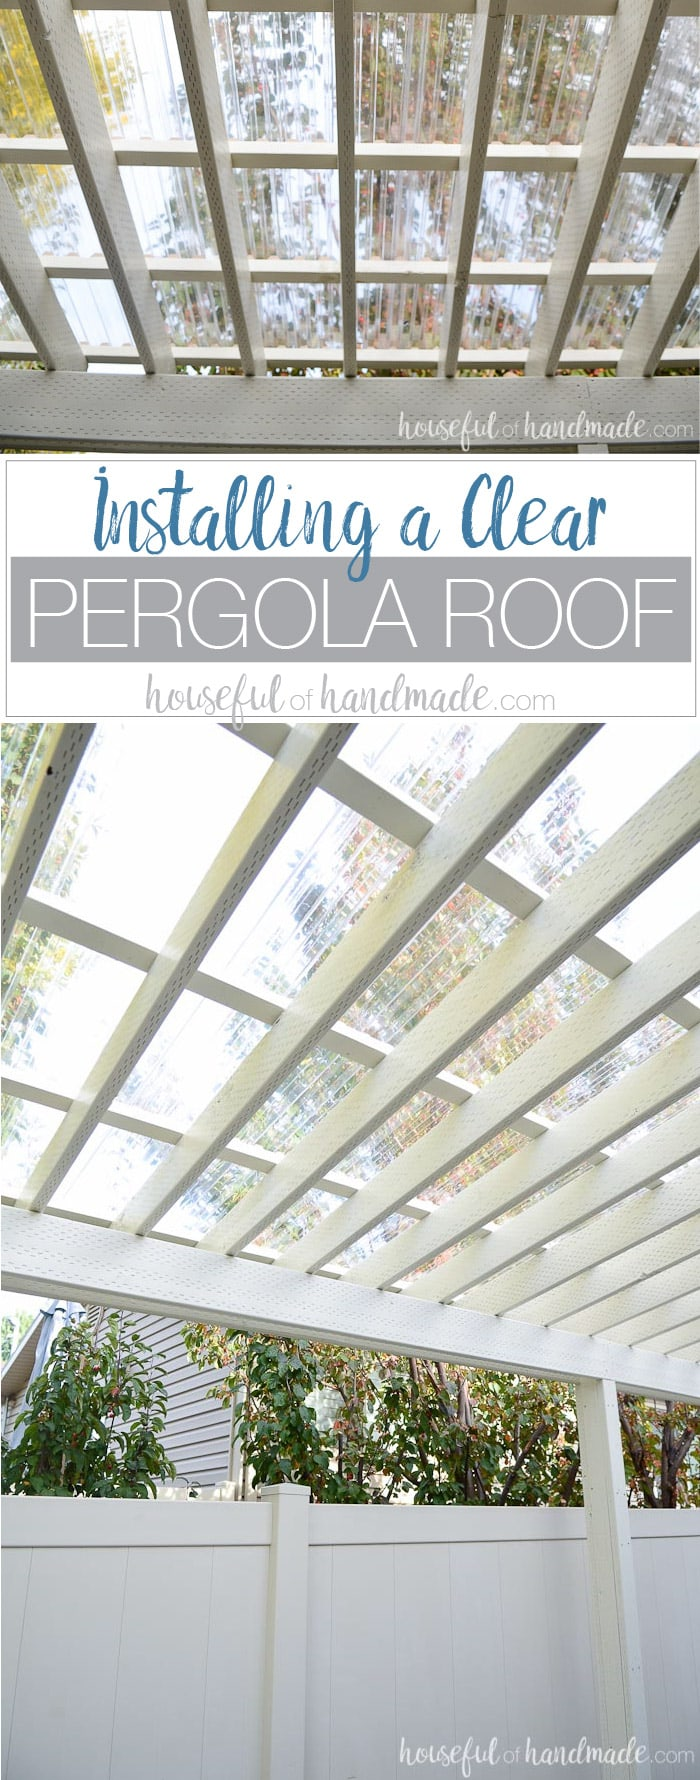 Installing A Clear Pergola Roof A Houseful Of Handmade